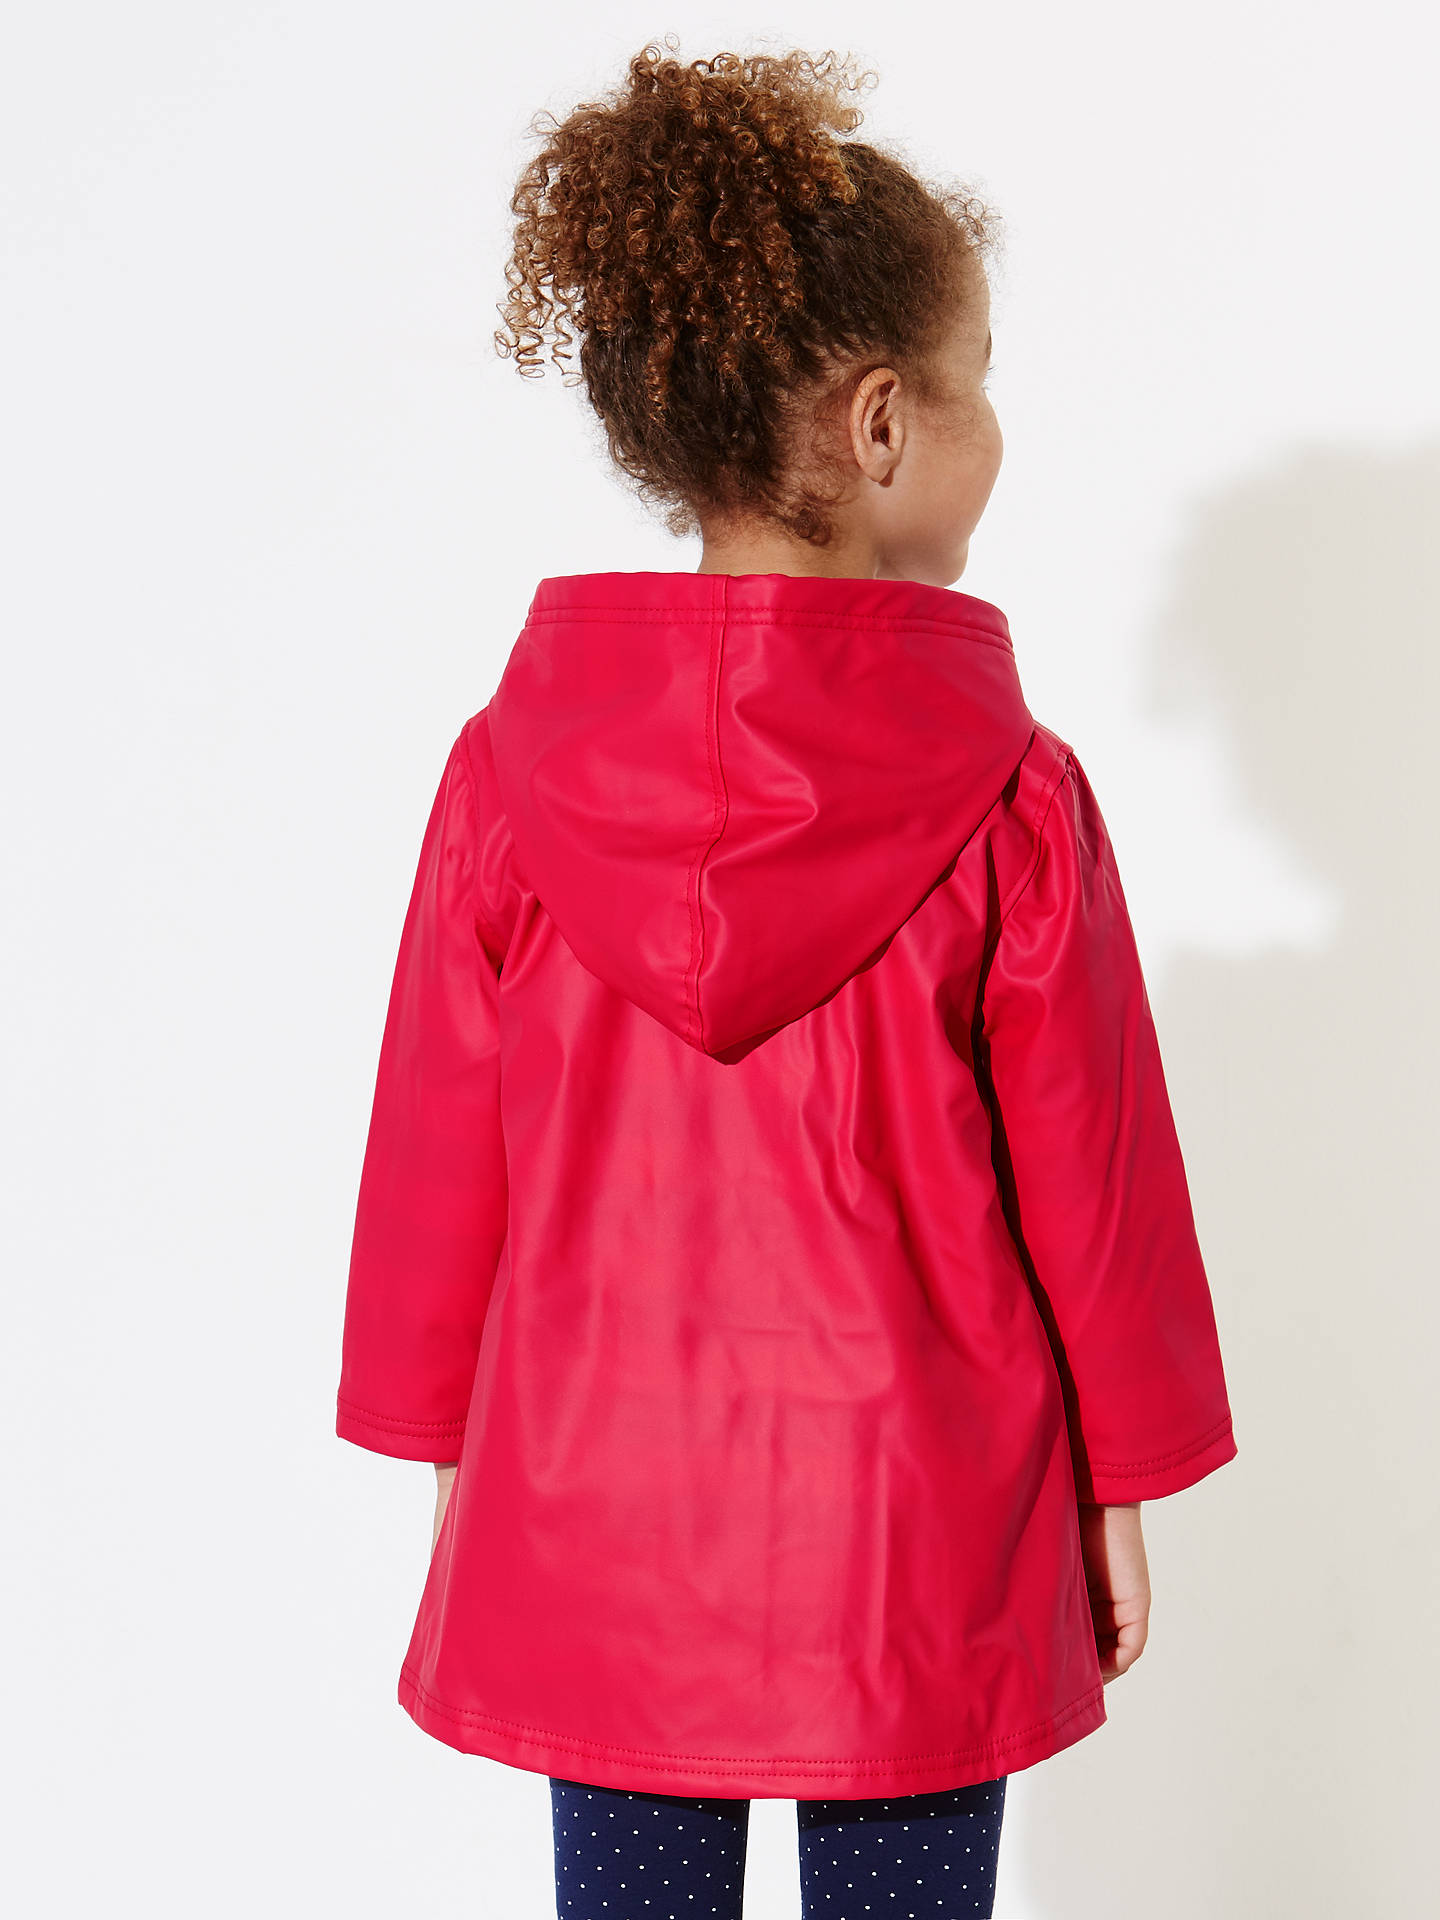 05d86be5989c Hatley Girls  Splash Jacket at John Lewis   Partners